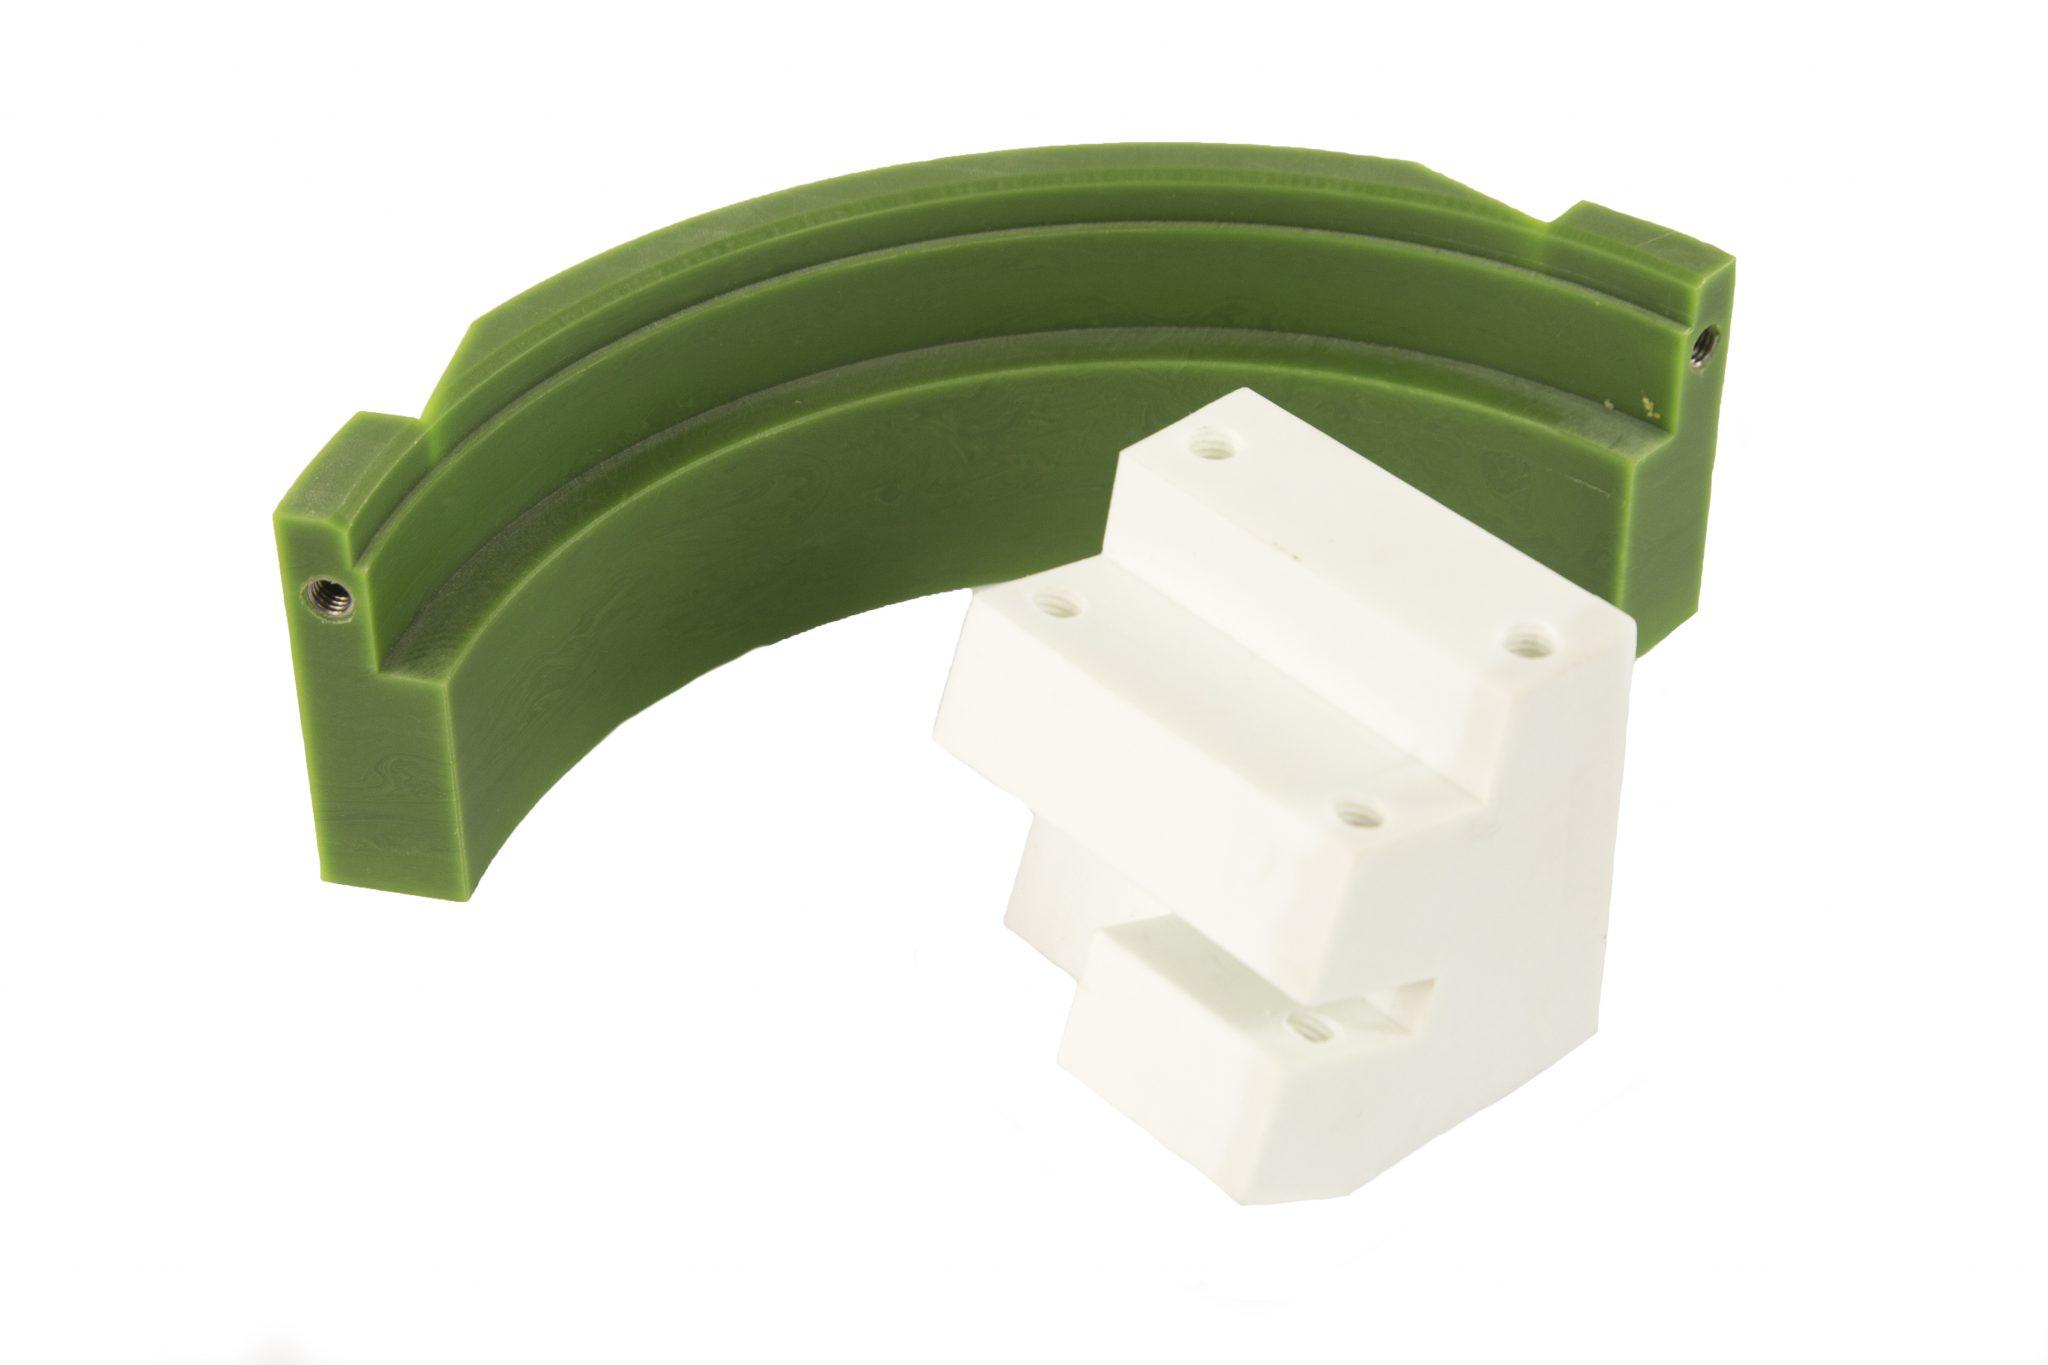 Makrolon - Polycarbonate - Lexan - CNC Machining - Plastic Fabrication